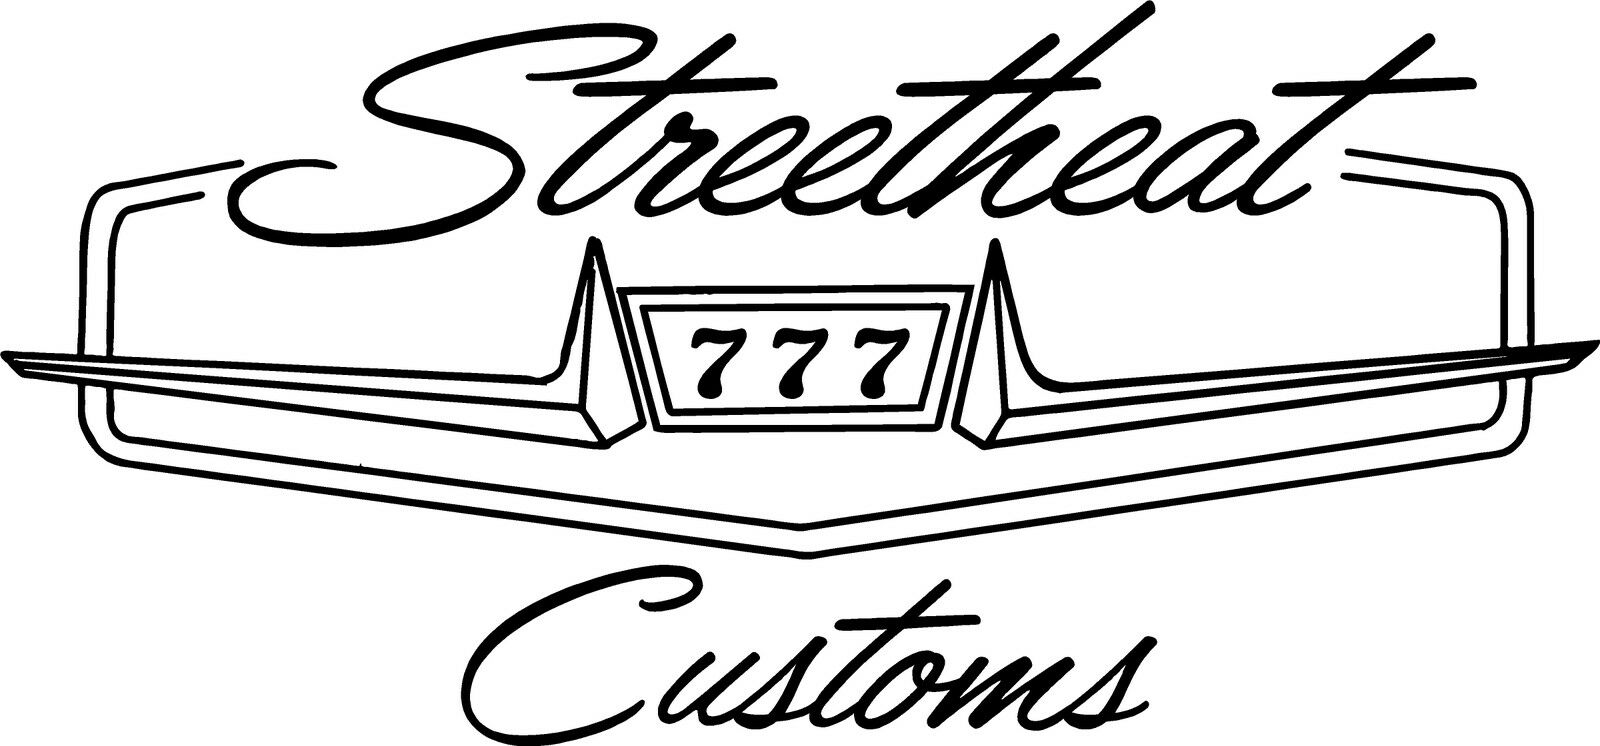 items in streetheatcustoms store on ebay